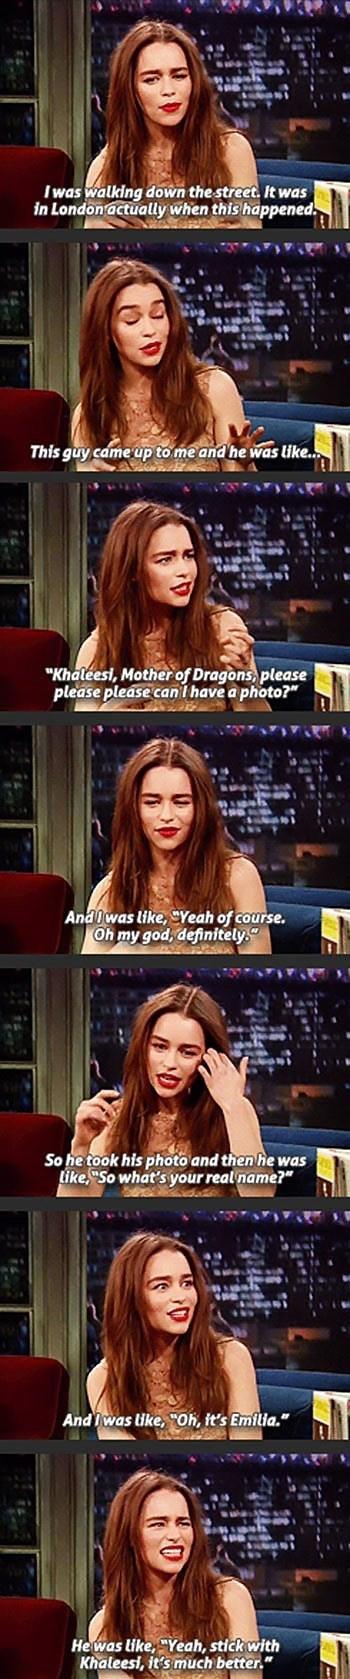 Game of Thrones,Emilia Clarke,interview